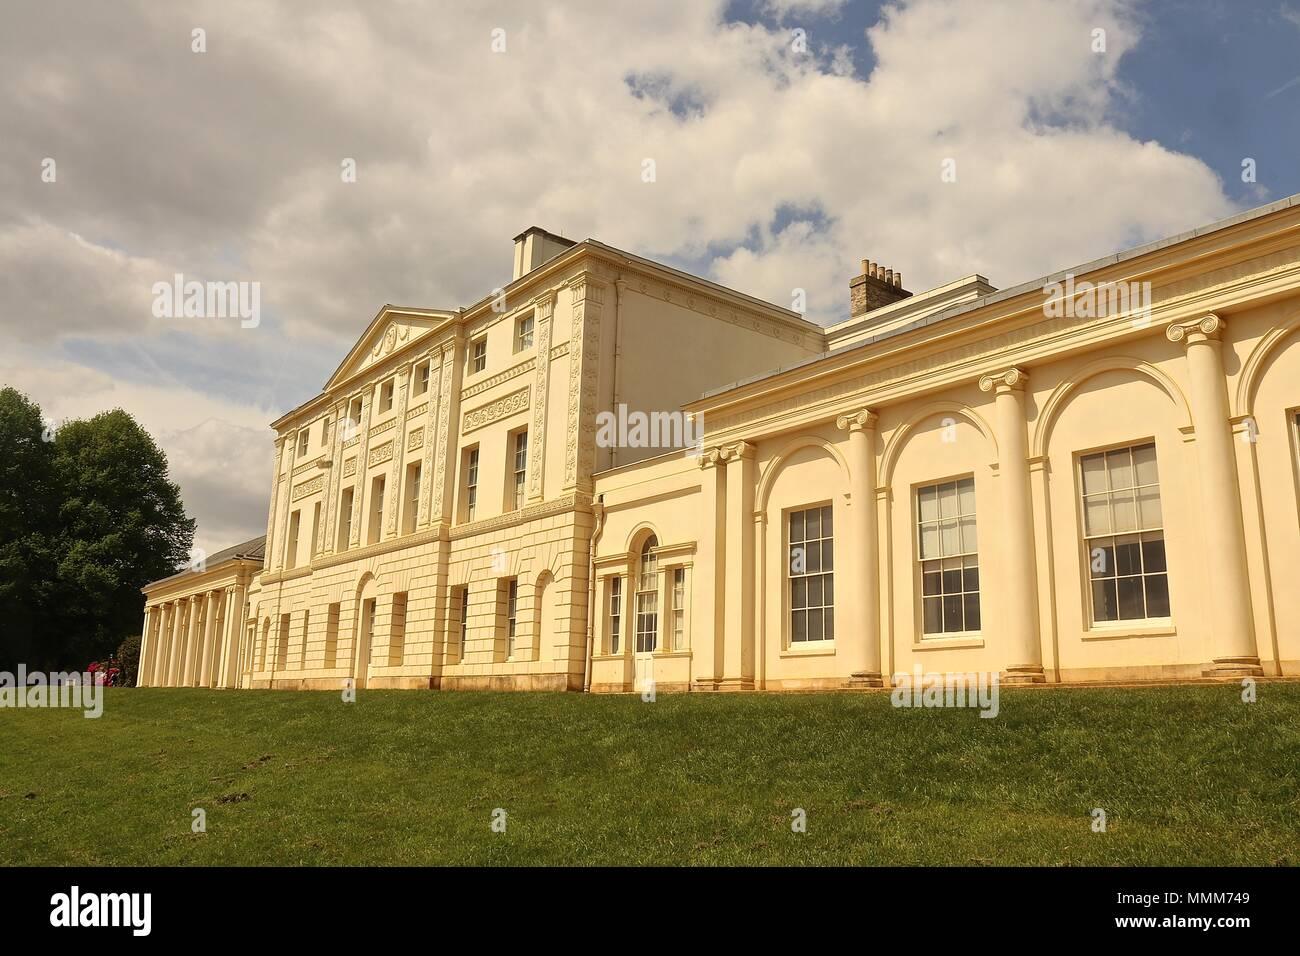 Kenwood House hampstead Heath May 2018 - Stock Image